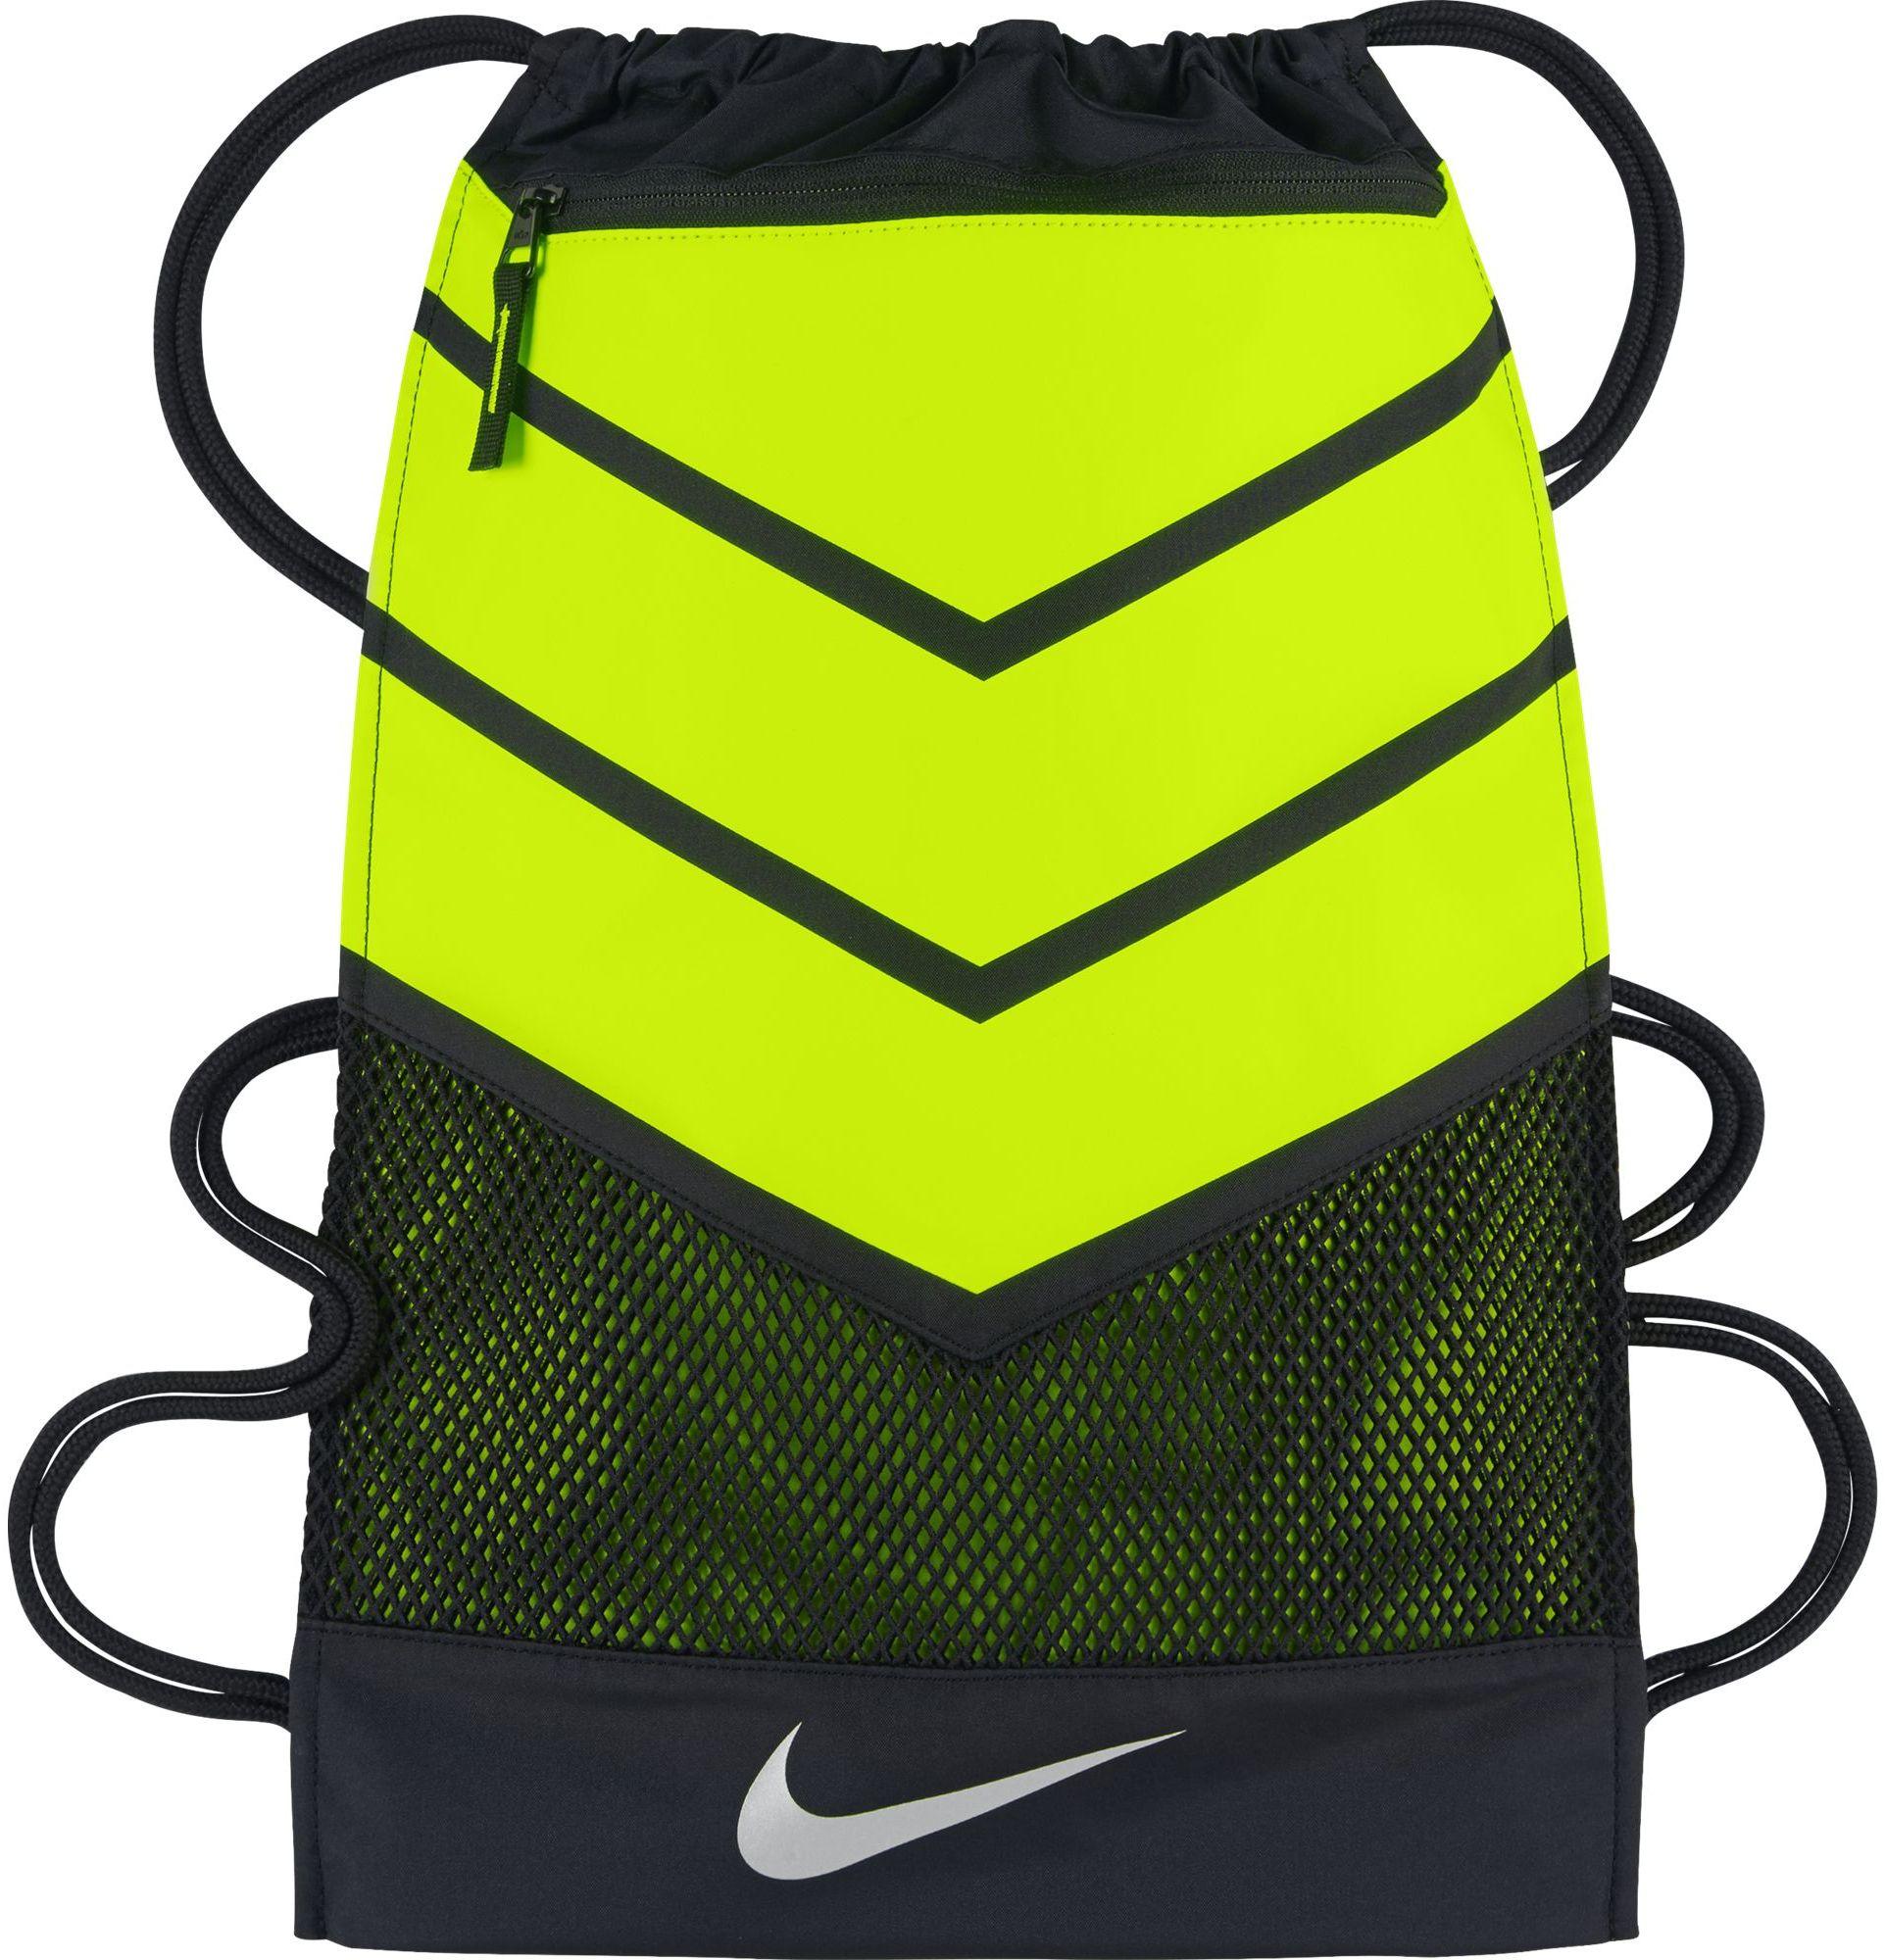 Nike VAPOR 2.0 GYM SACK Tornazsák | EnergyFitness.hu